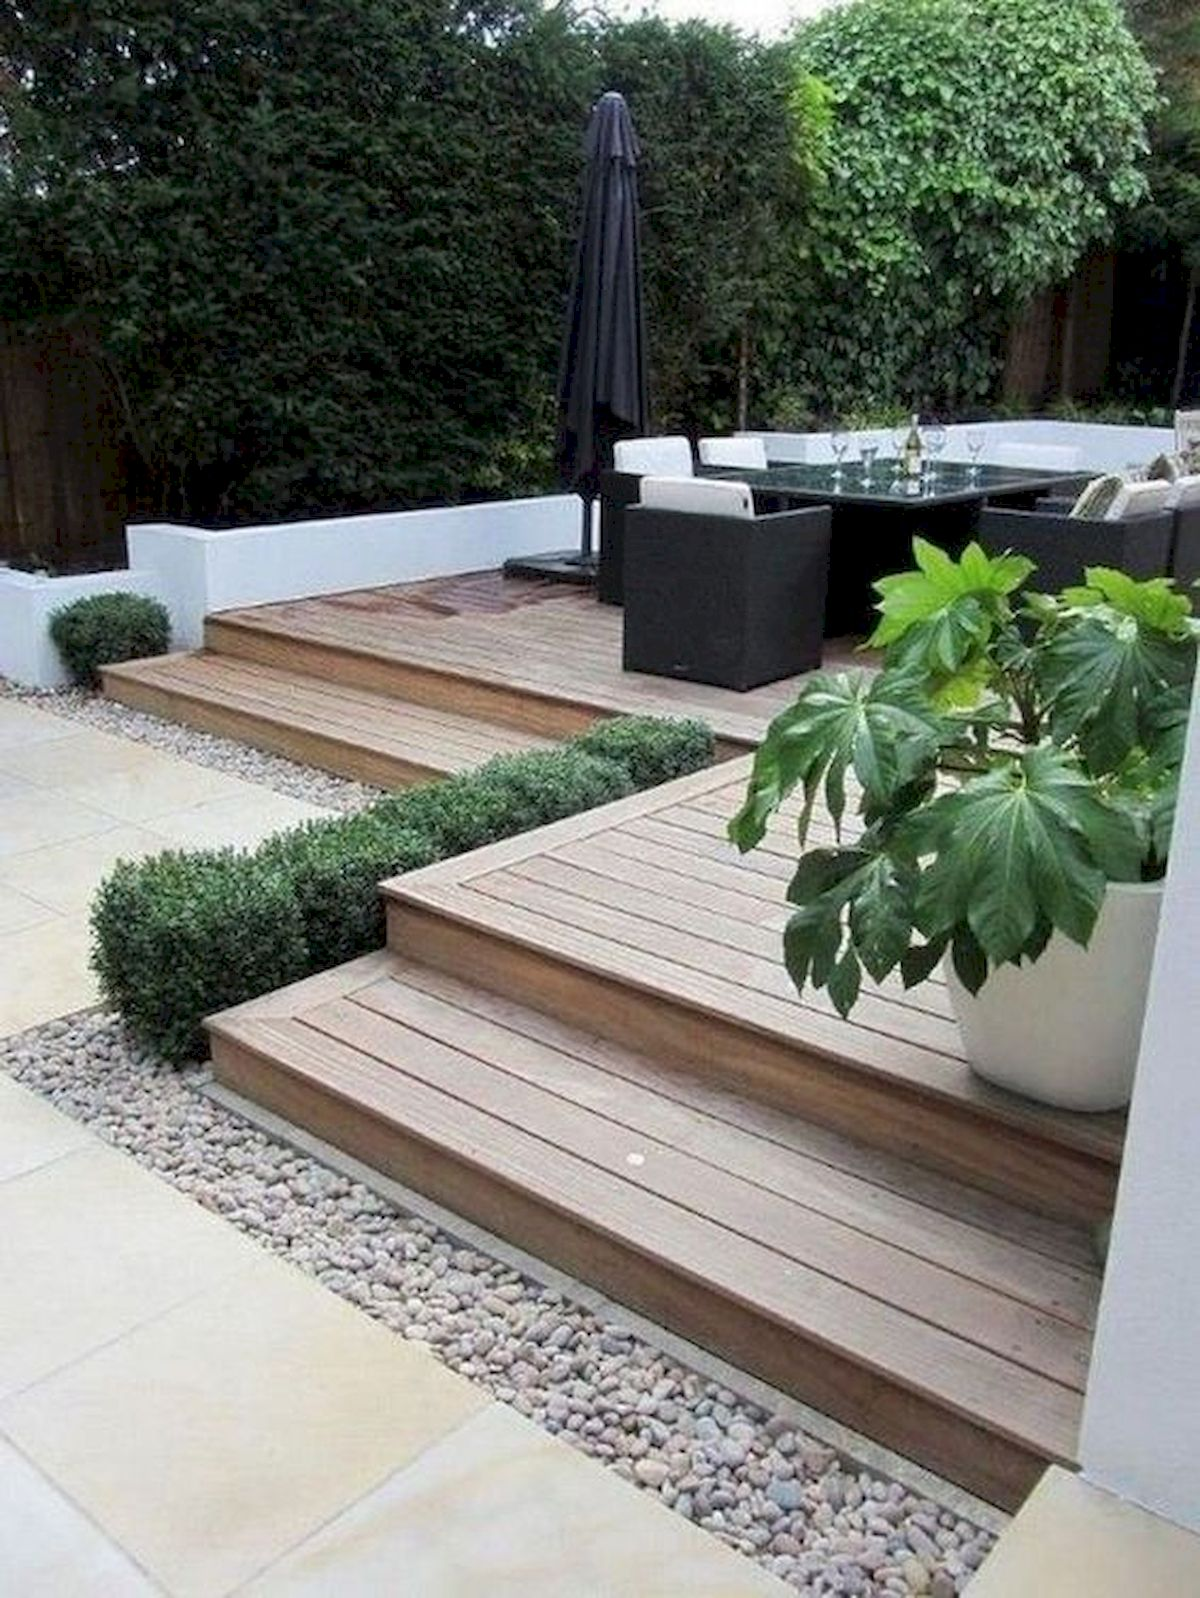 50 Fantastic Backyard Patio and Decking Design Ideas (10)